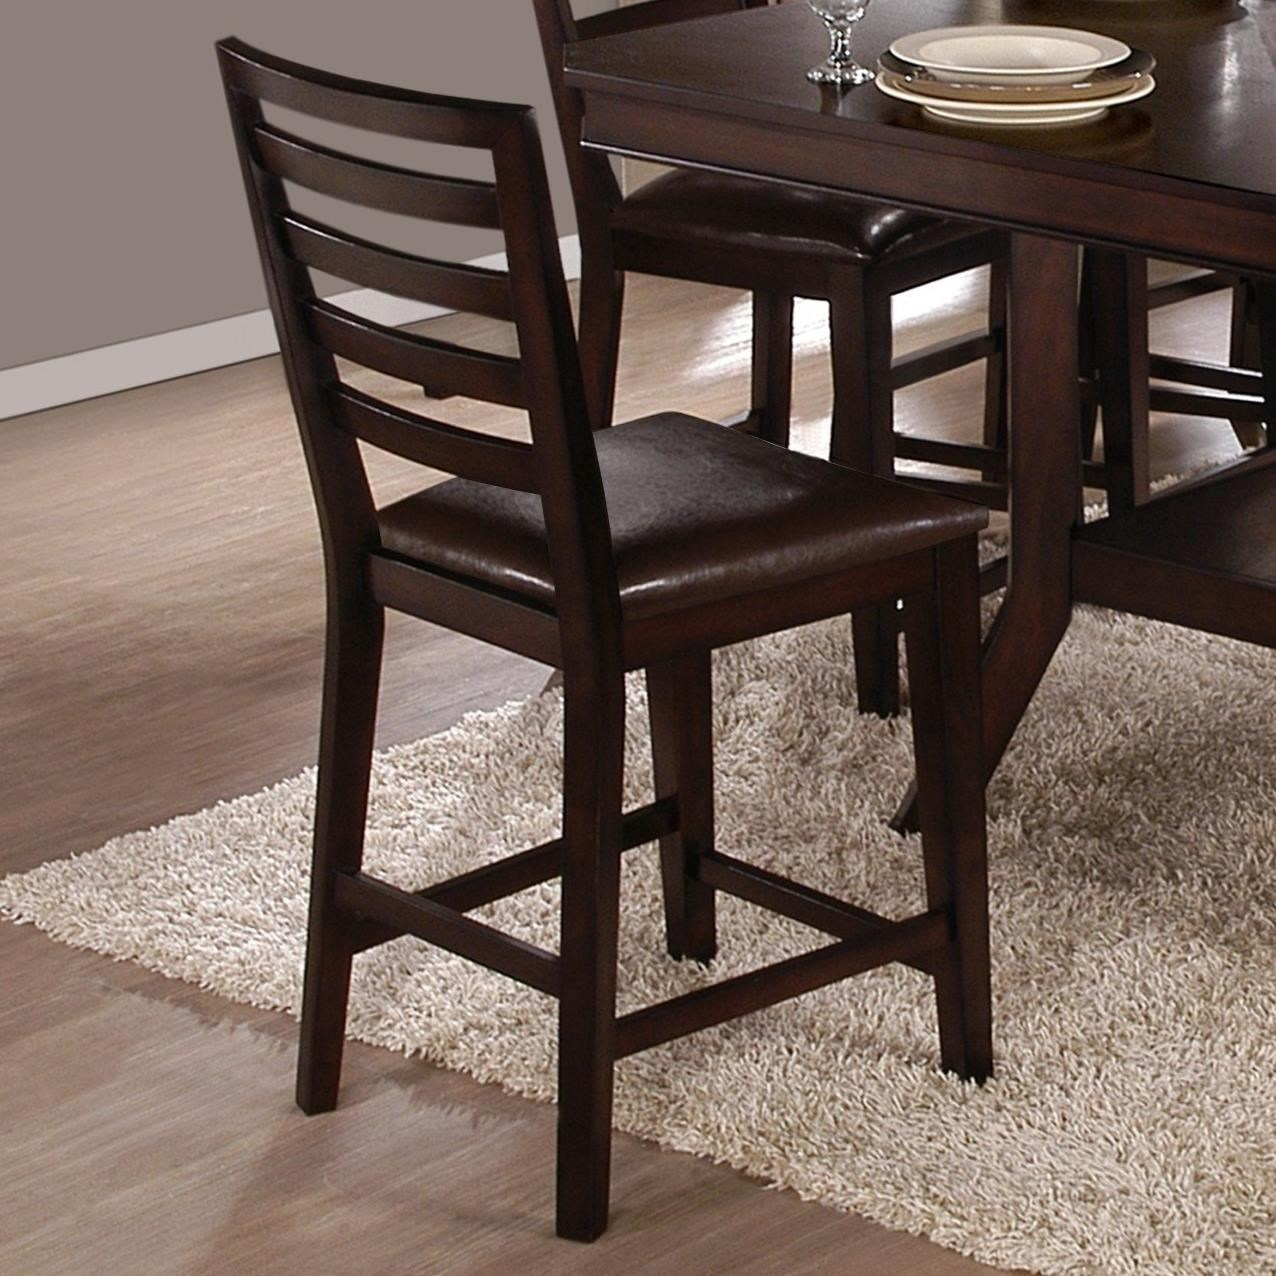 Progressive Furniture Bobbie Counter Chair - Item Number: P832-63